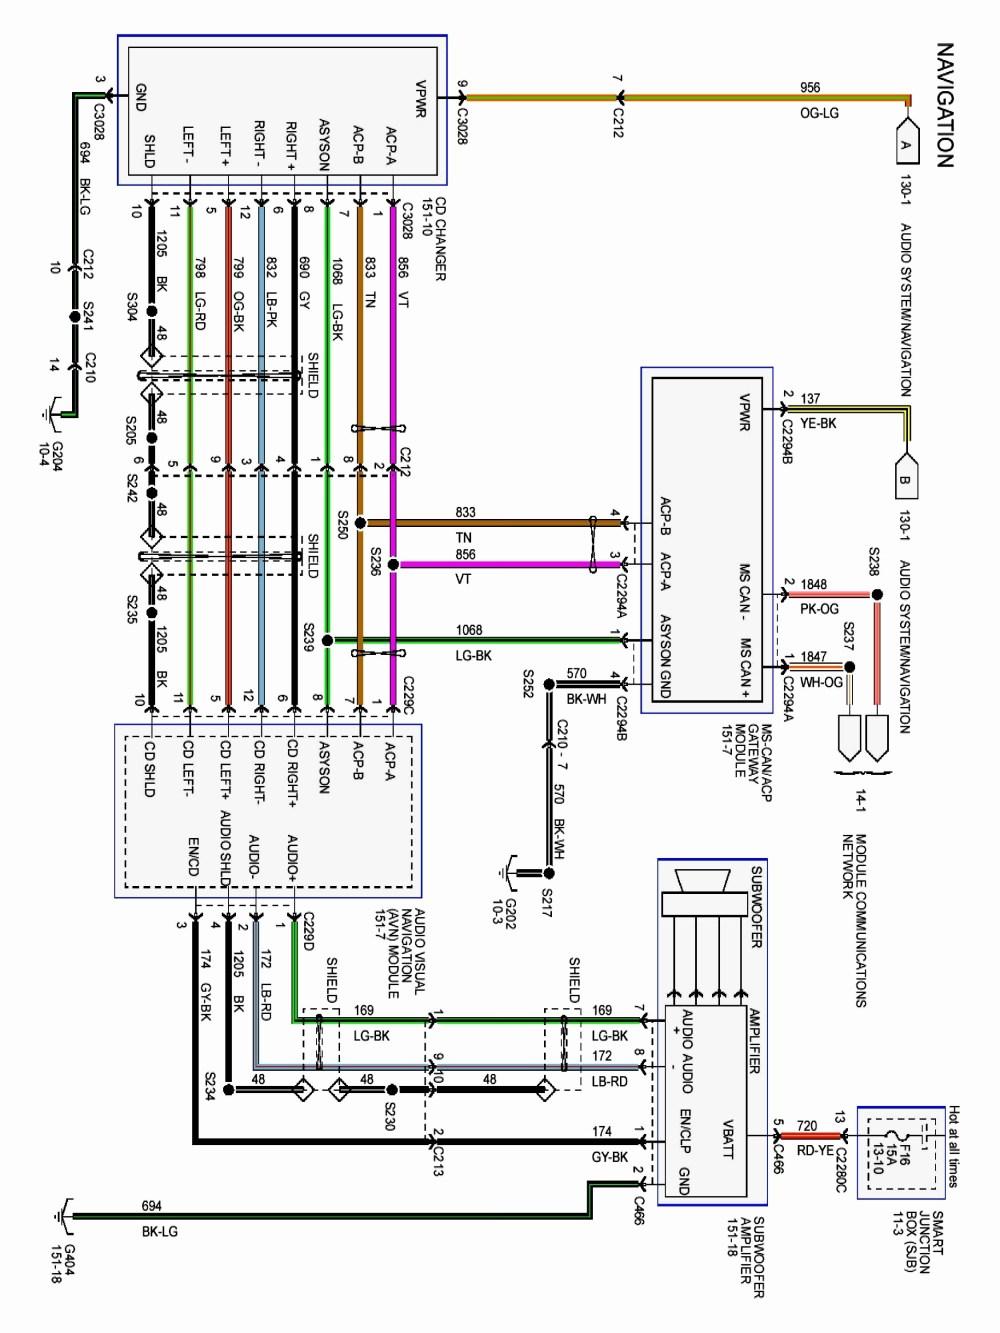 medium resolution of 2007 ford explorer engine diagram wiring diagram 40 inspirational 2007 ford explorer wiring diagram of 2007